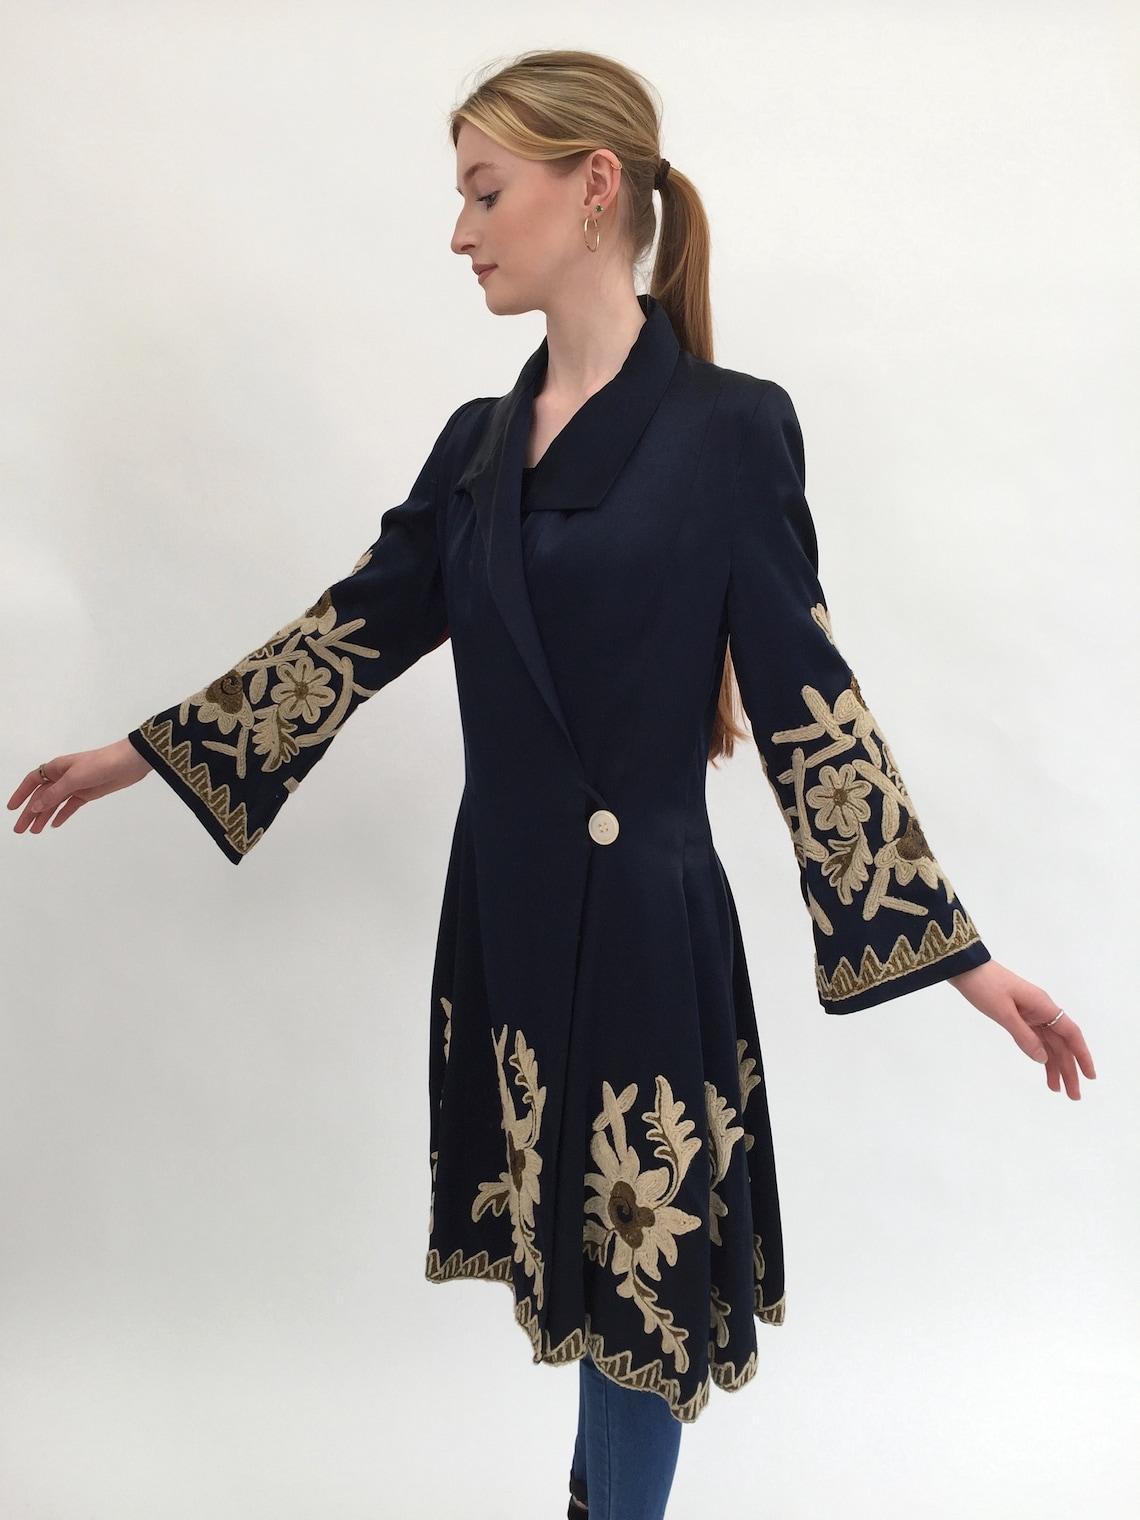 1920s Embroidered Couture Coat Vintage Antique Art Deco